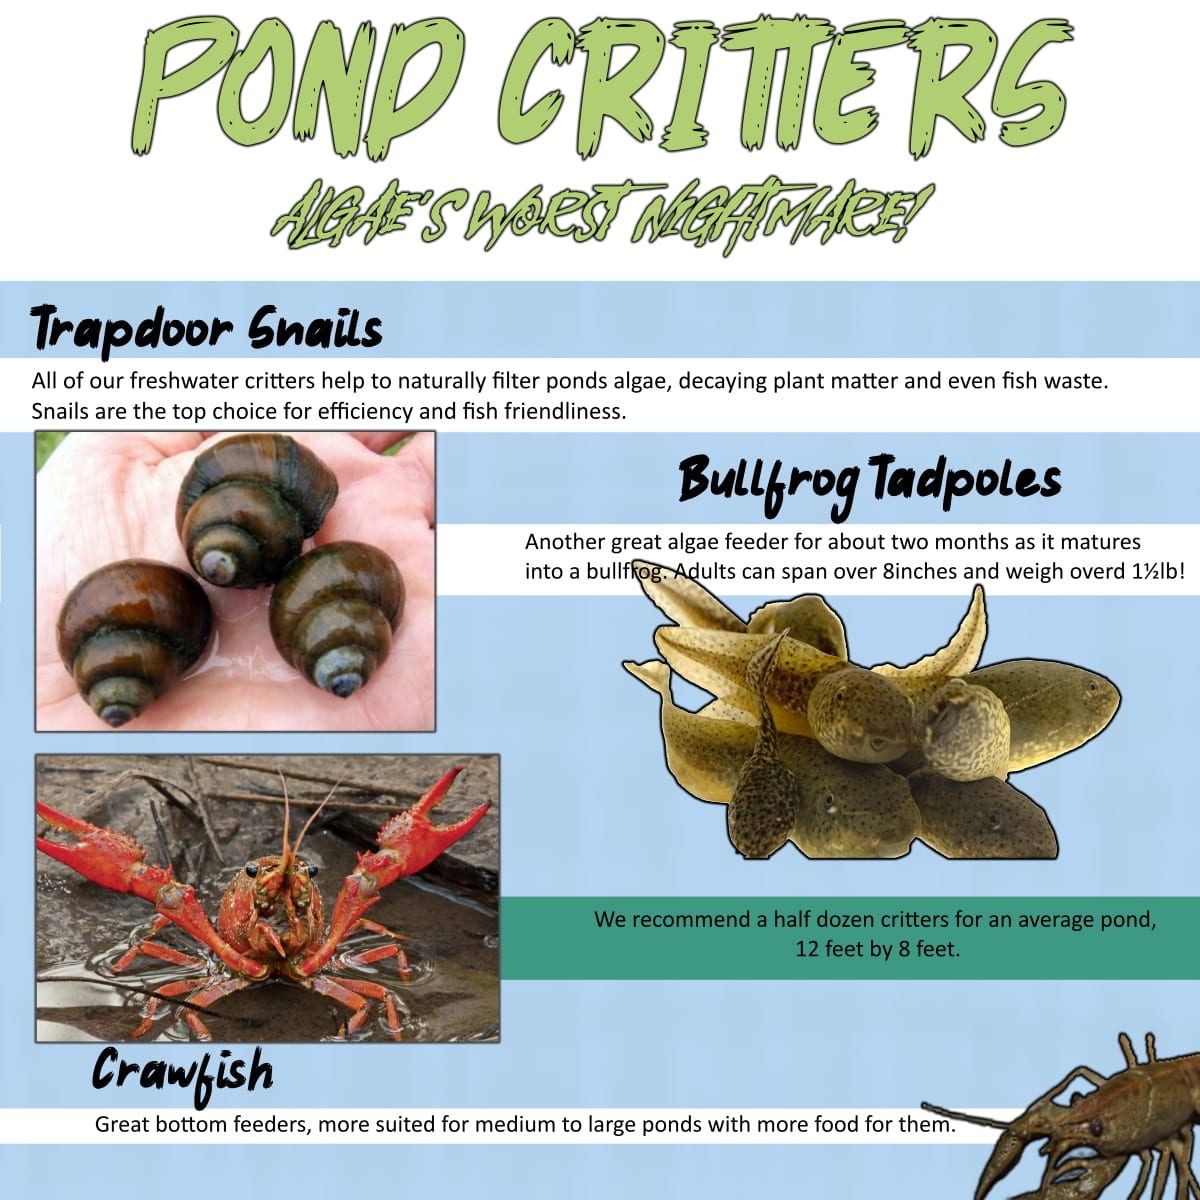 Crawfish, Trapdoor Snails and Bullfrog Tadpoles